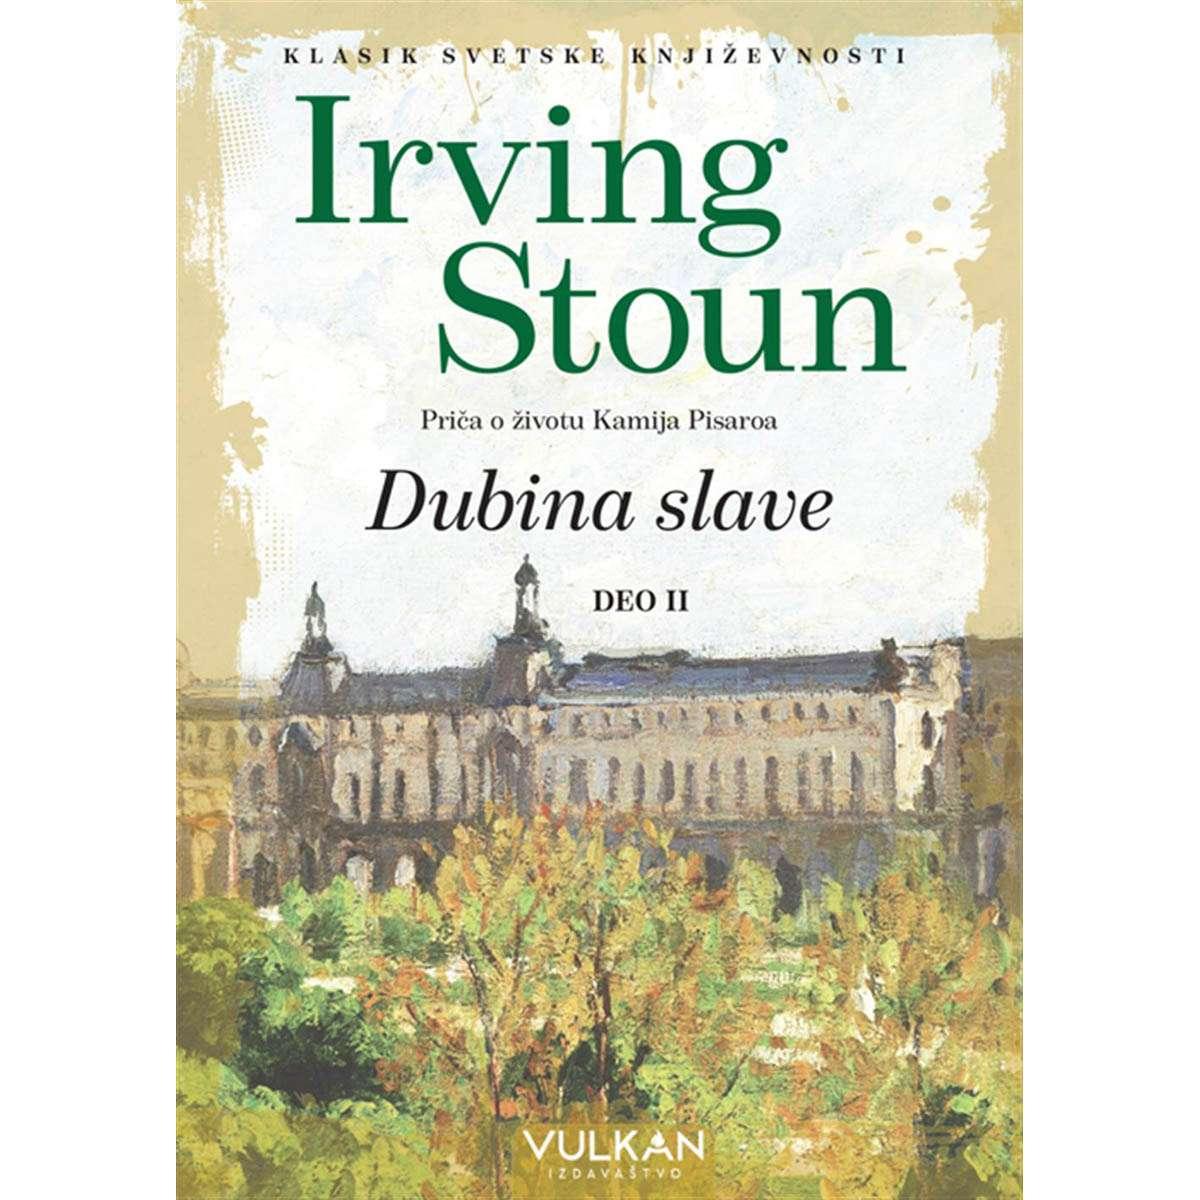 DUBINA SLAVE Deo II